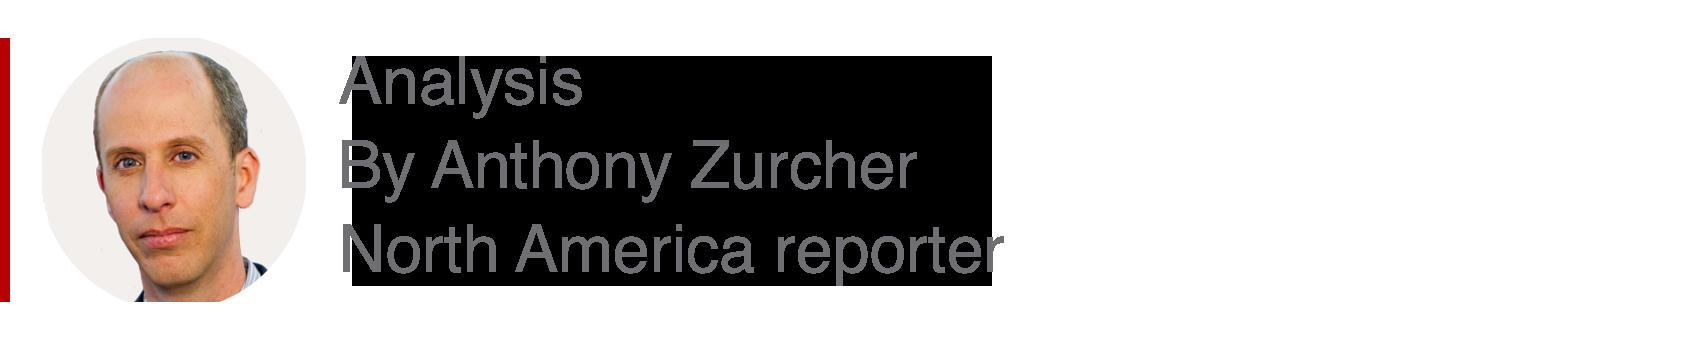 Analysis box by Anthony Zurcher, North America reporter